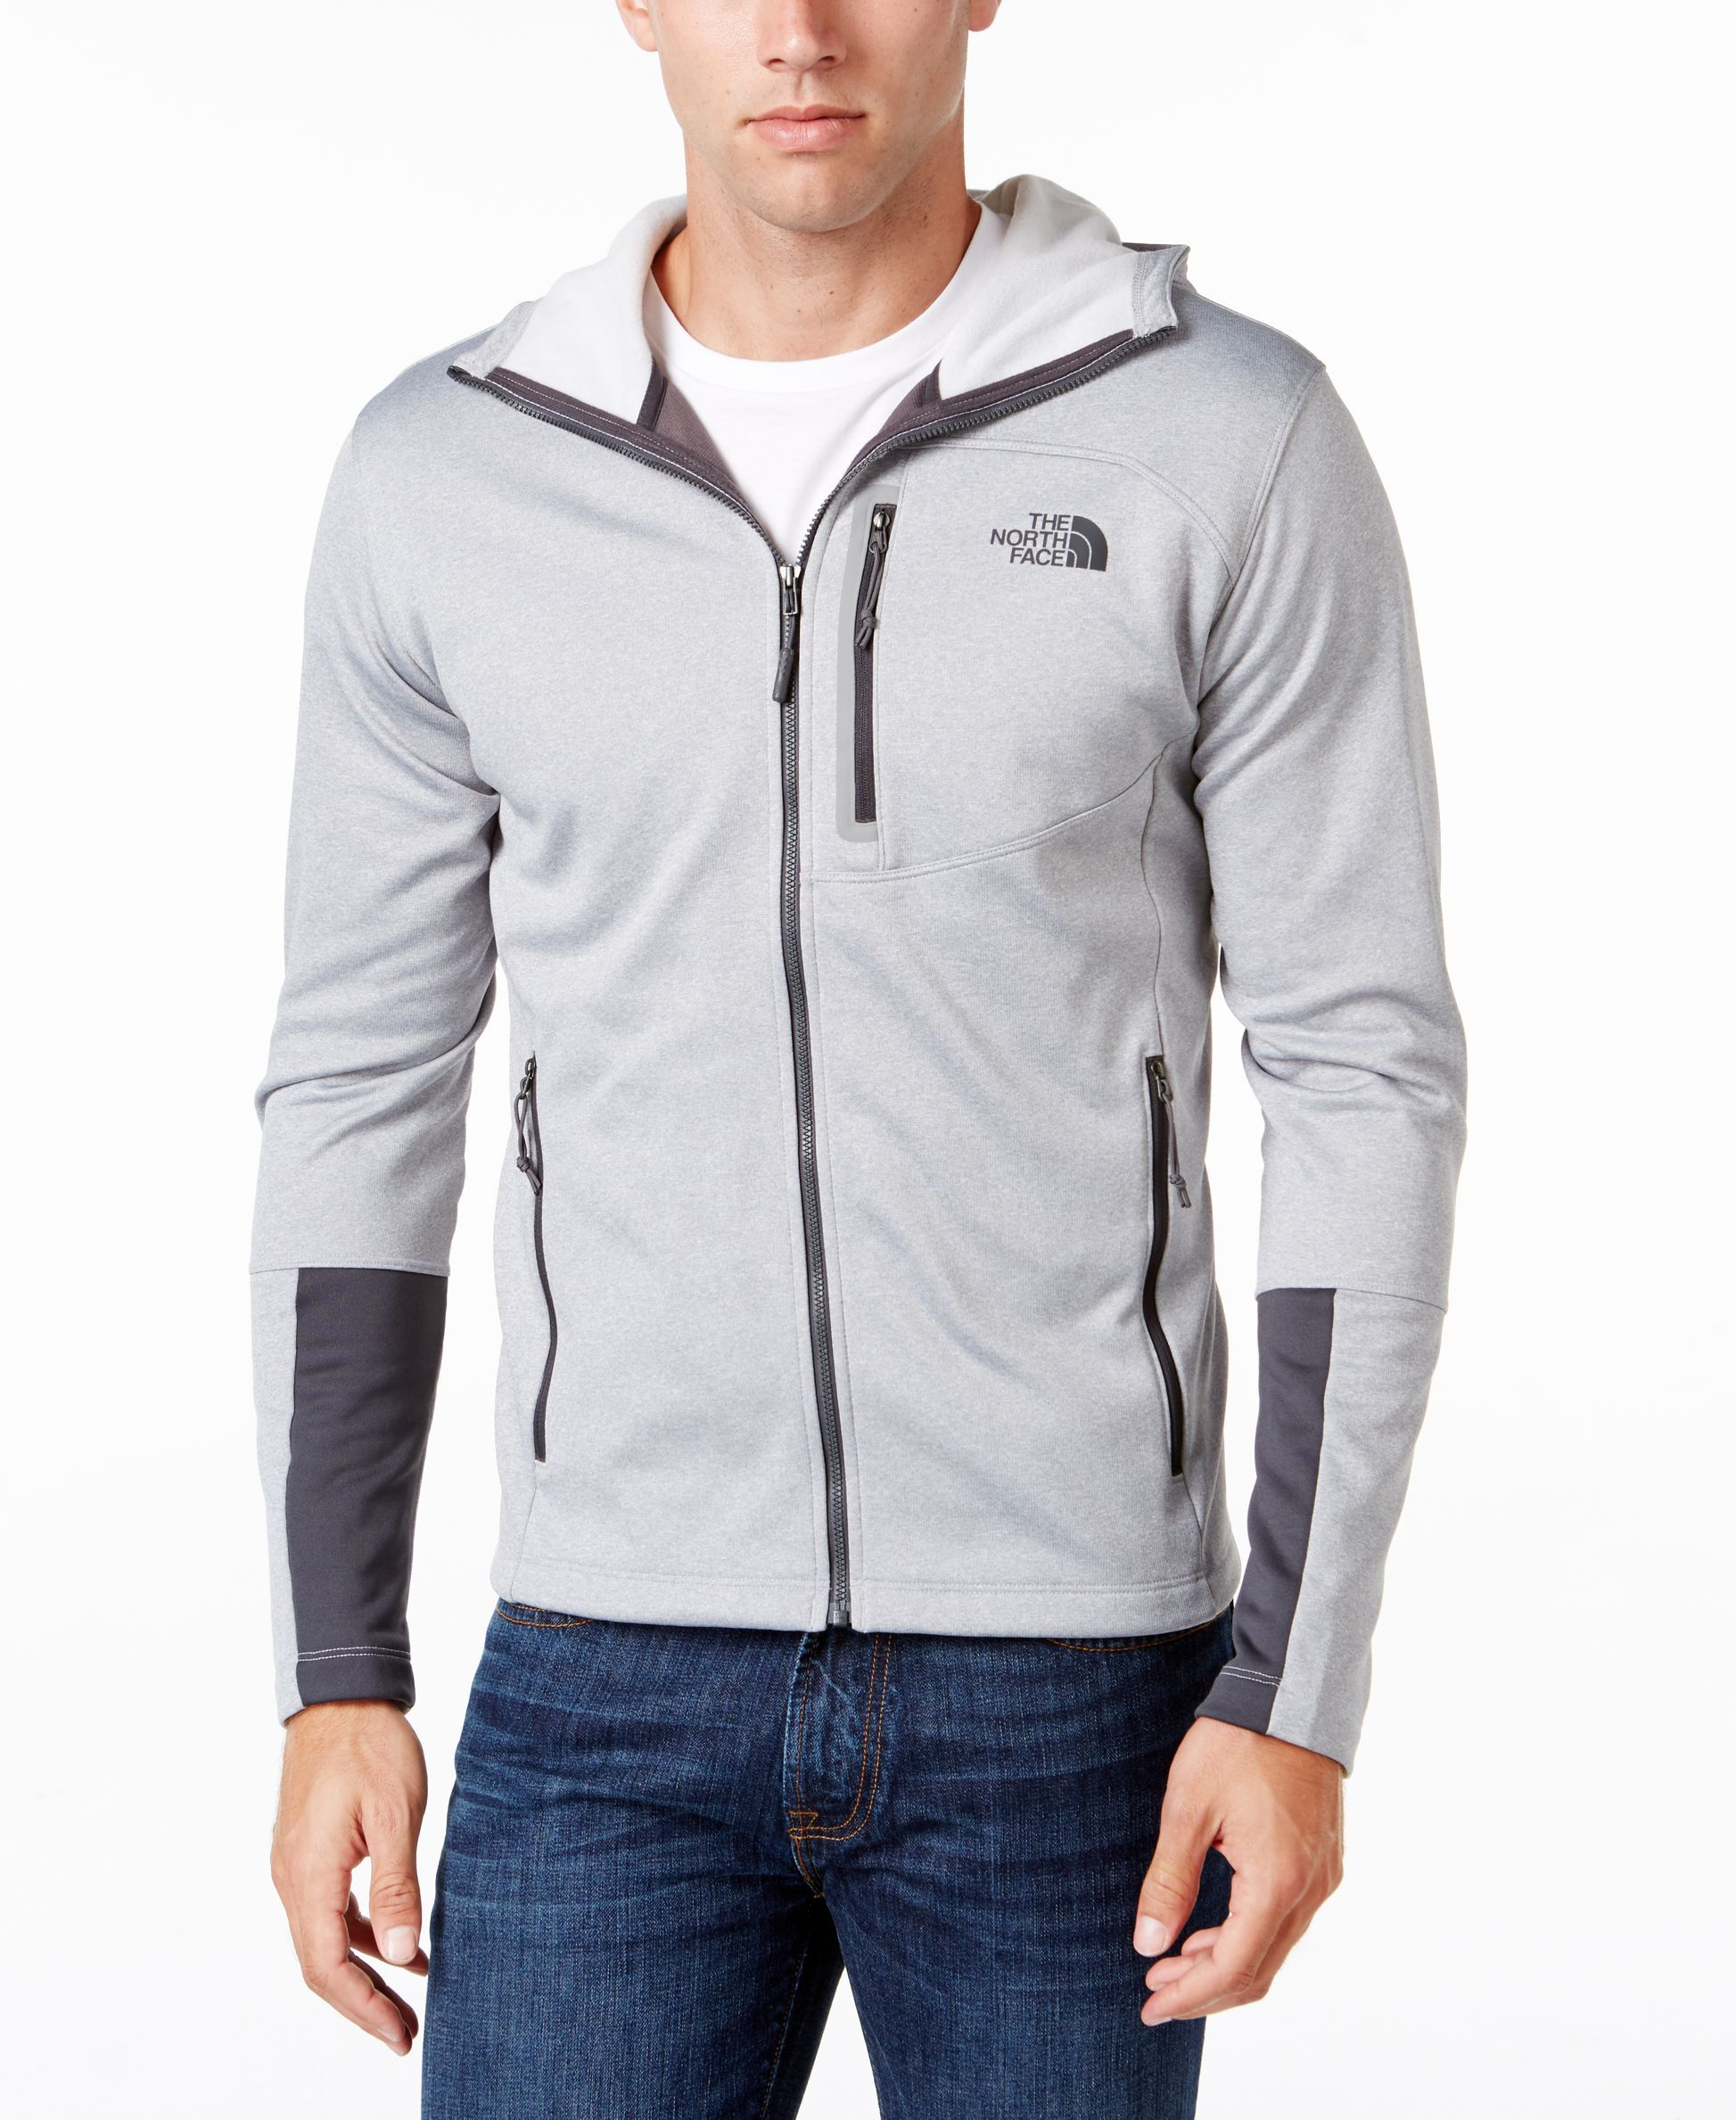 The North Face Men S Canyonlands Full Zip Hoodie North Face Mens Full Zip Hoodie Mens Sweatshirts [ 2378 x 1947 Pixel ]